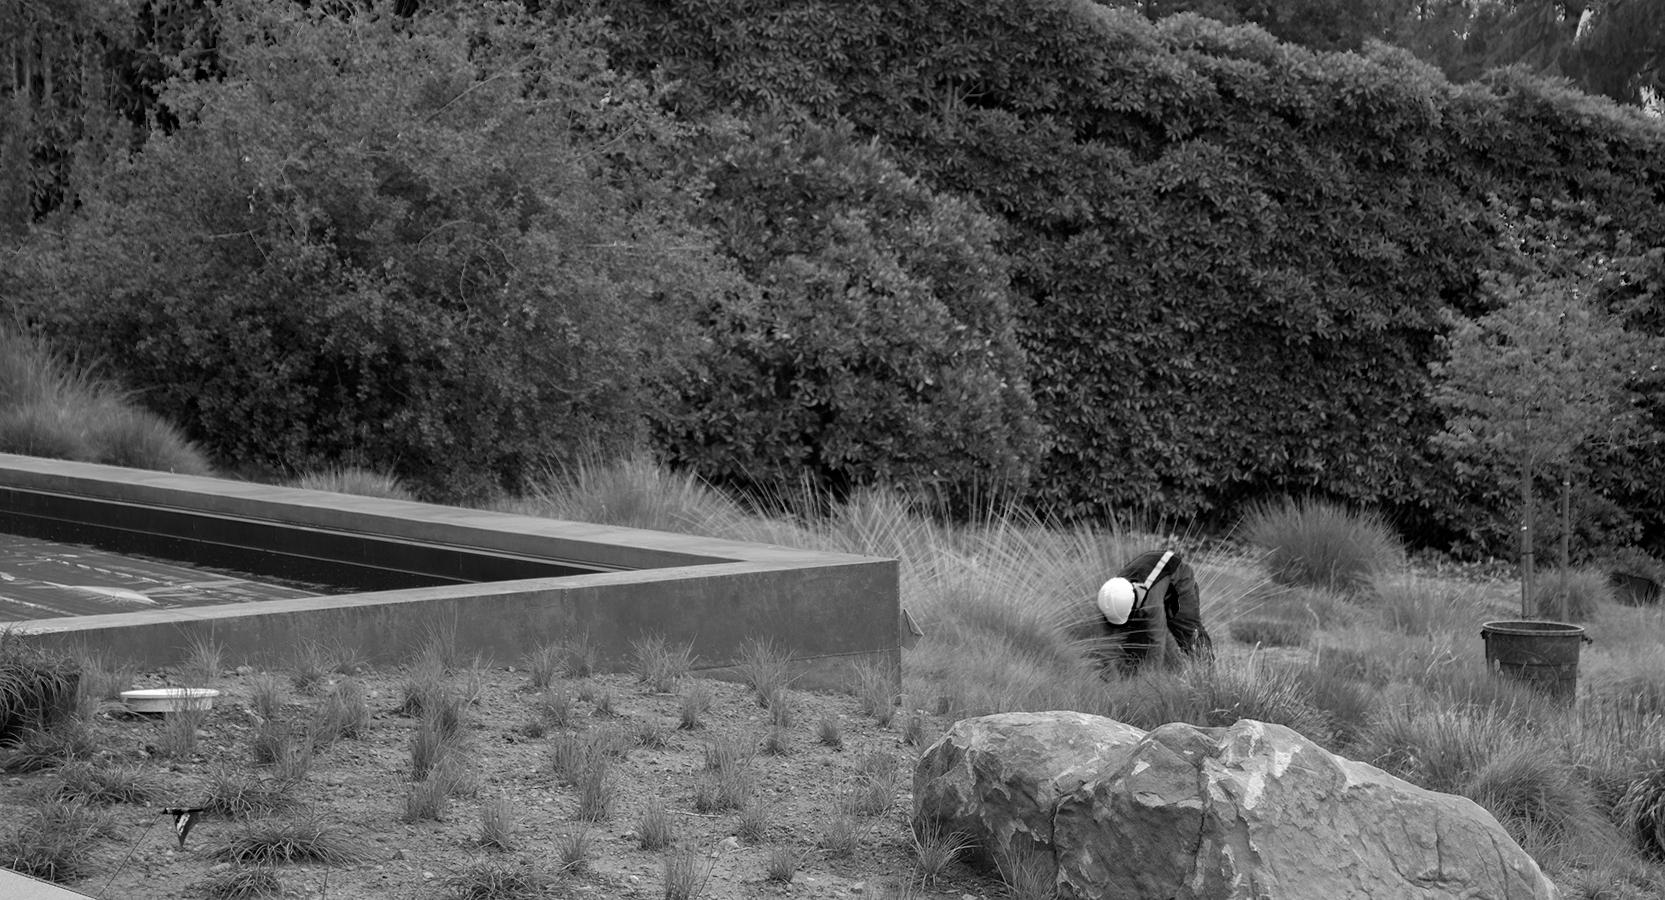 Chepe planting at black_IMG_0160_sm.jpg